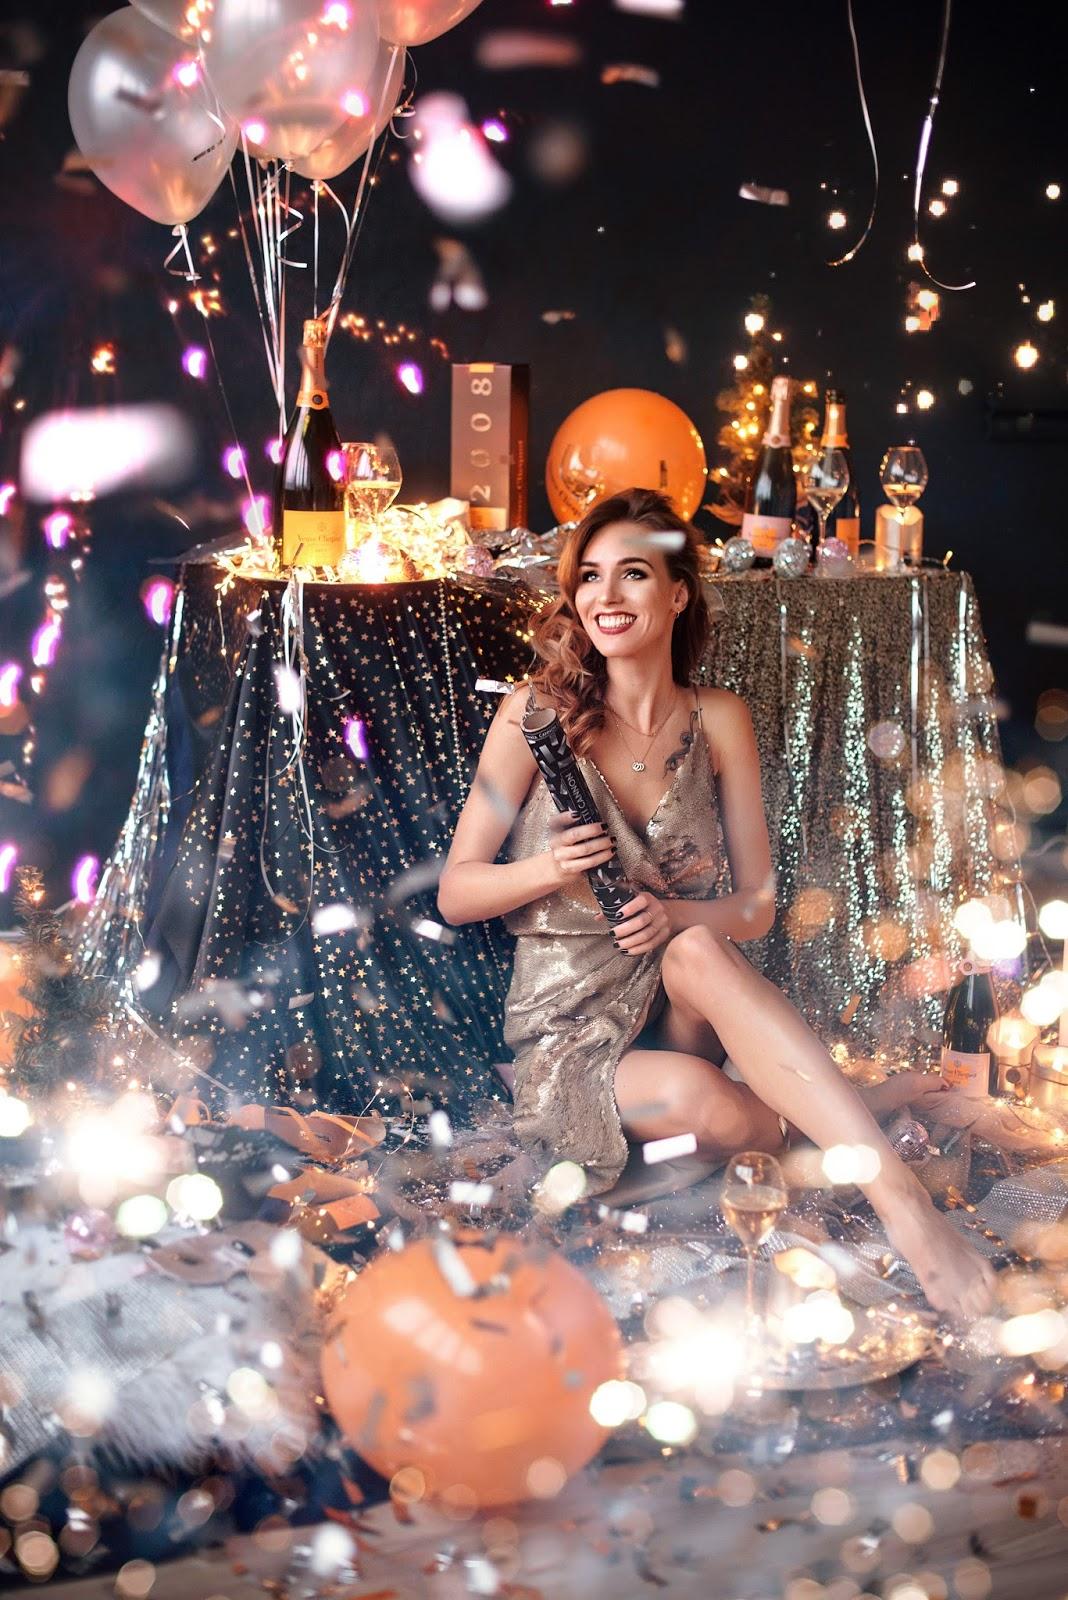 veuve clicquot champagne party celebration photography